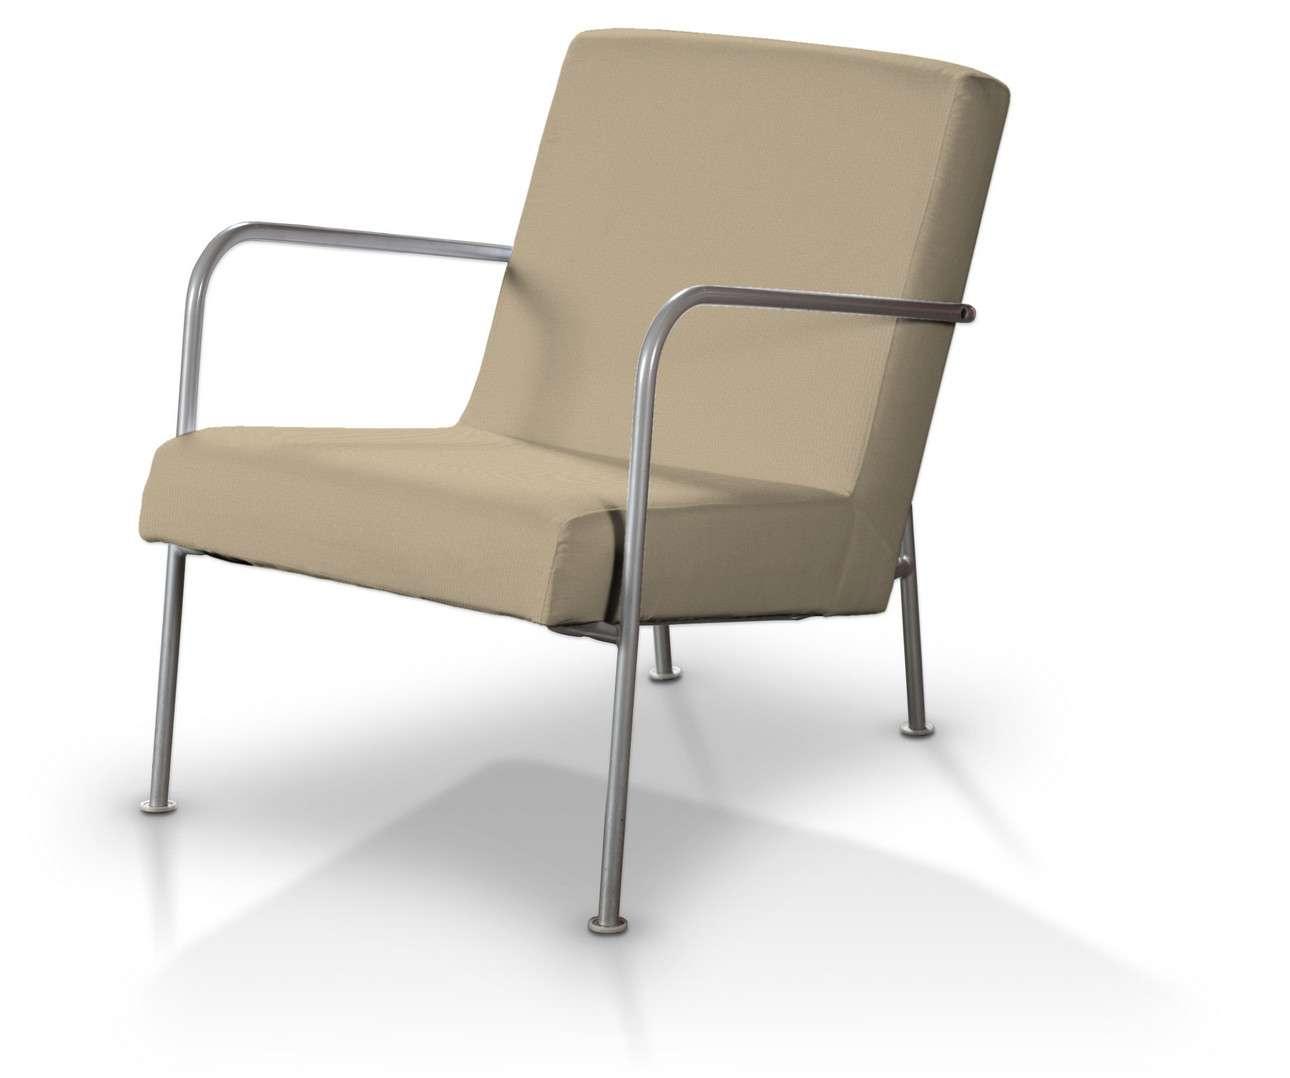 Pokrowiec na fotel Ikea PS w kolekcji Living II, tkanina: 160-82